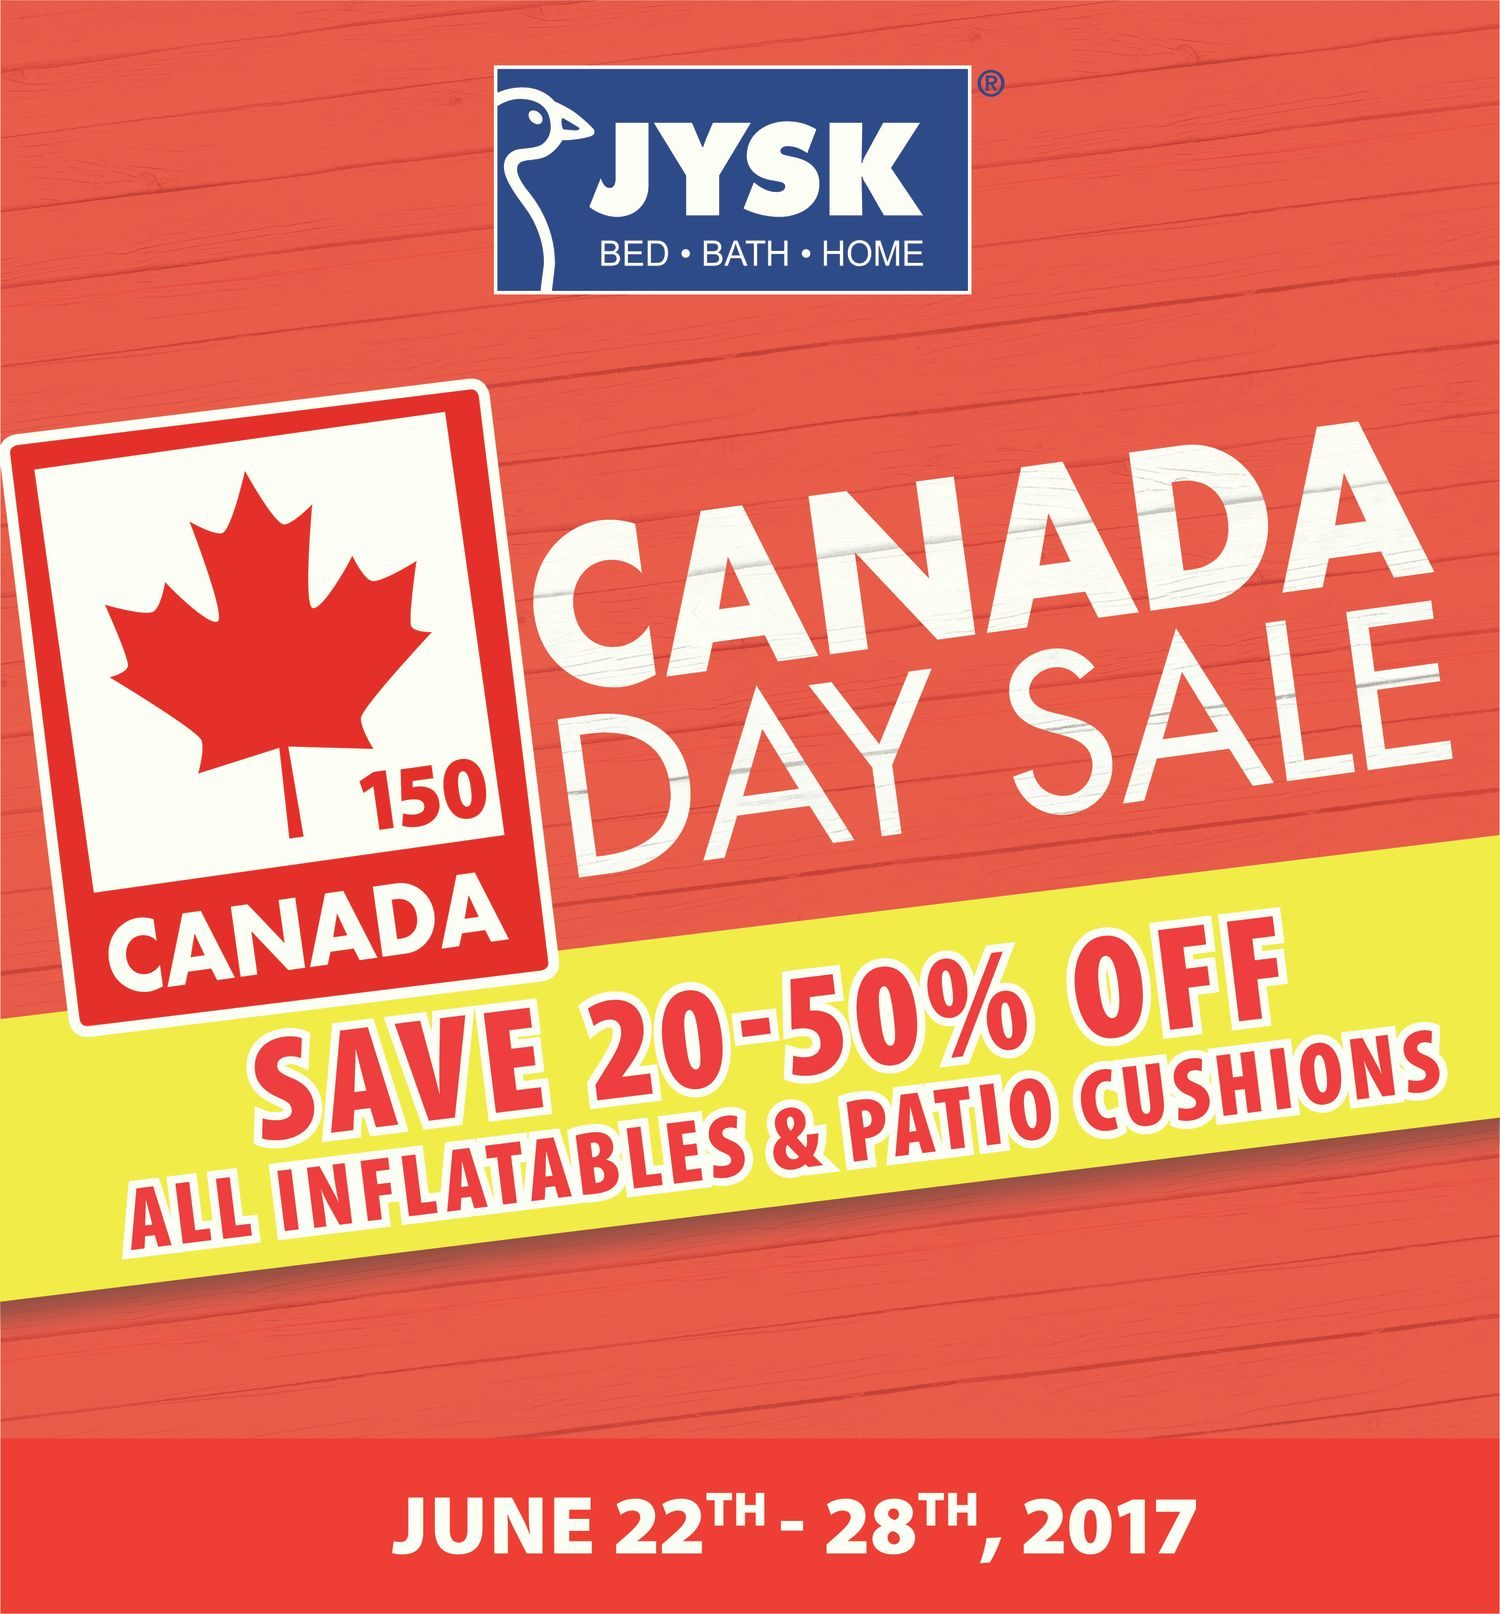 JYSK Weekly Flyer Weekly Canada Day Sale Jun 22 – 28